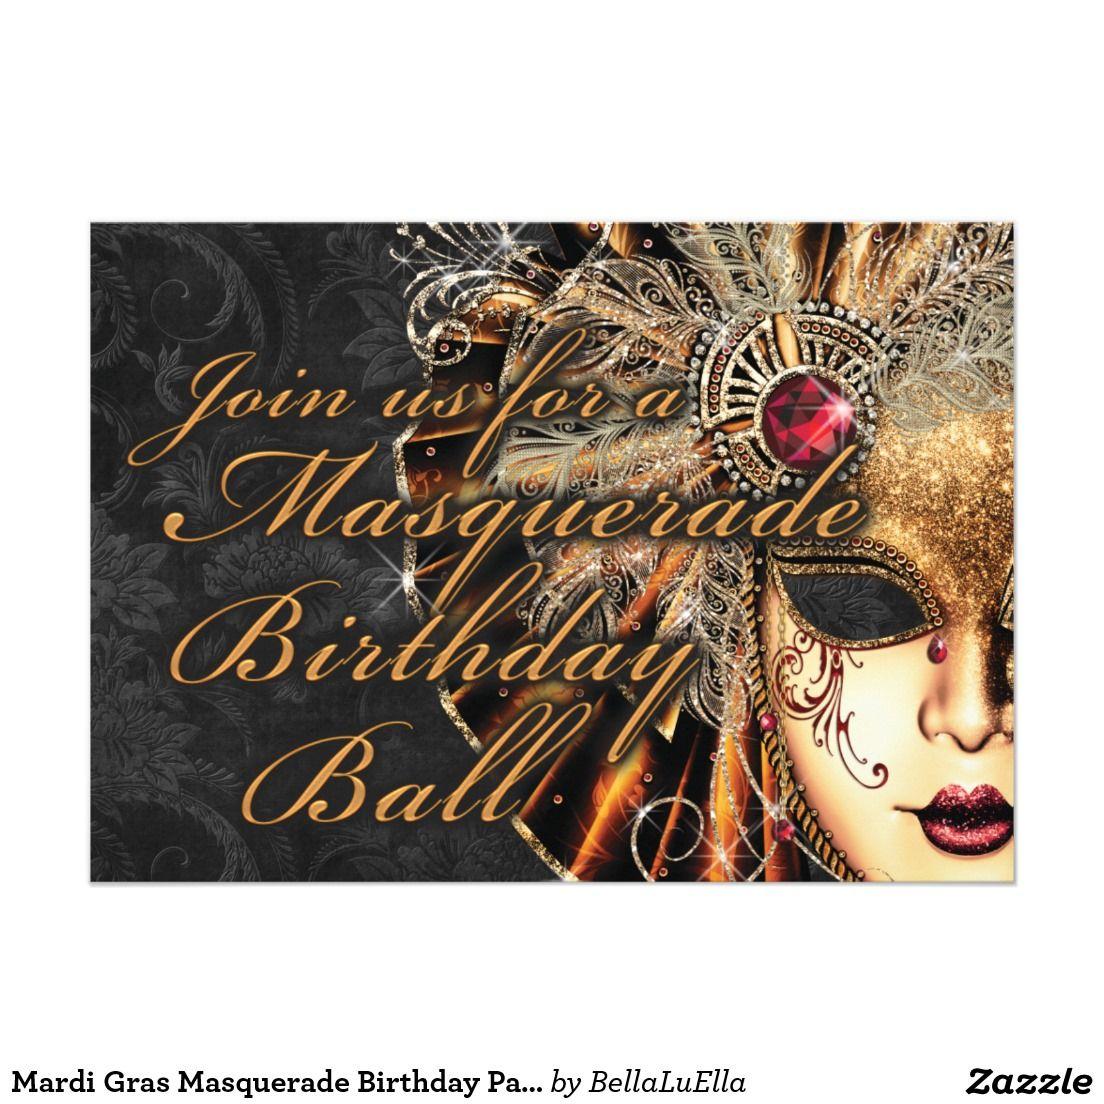 Mardi Gras Masquerade Birthday Party Invitation | Adult Birthday ...